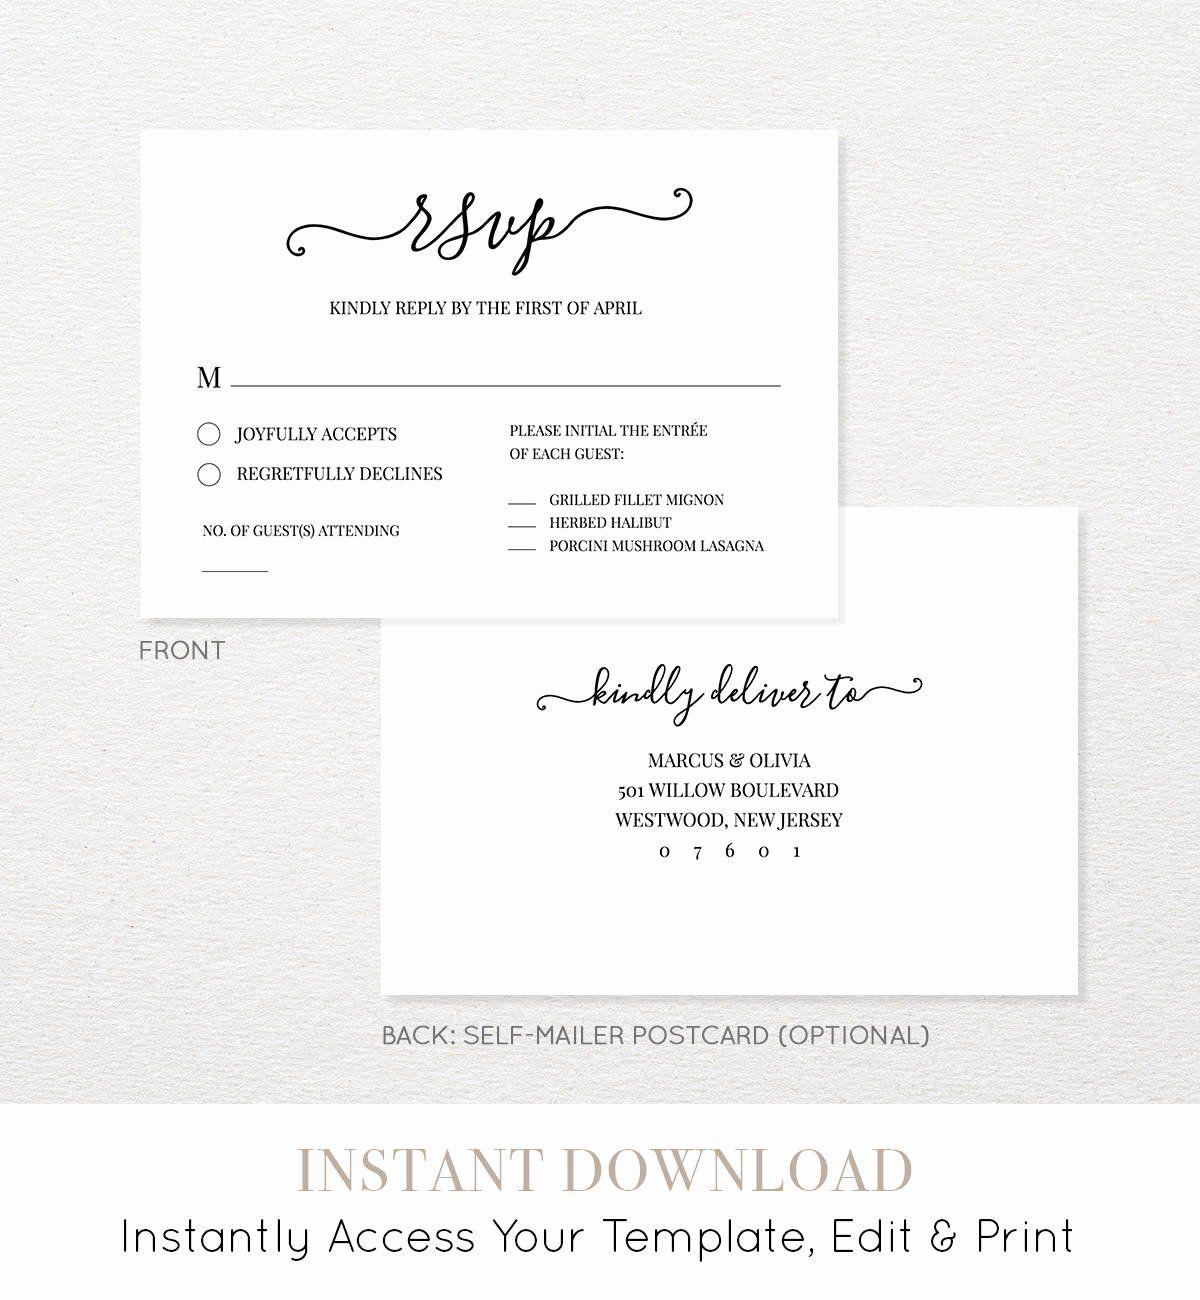 Wedding Rsvp Postcards Template Fresh Wedding Rsvp Card Template We Do Heart Wedding Rsvp Wedding Cards Wedding Response Cards Wedding Rsvp Postcard